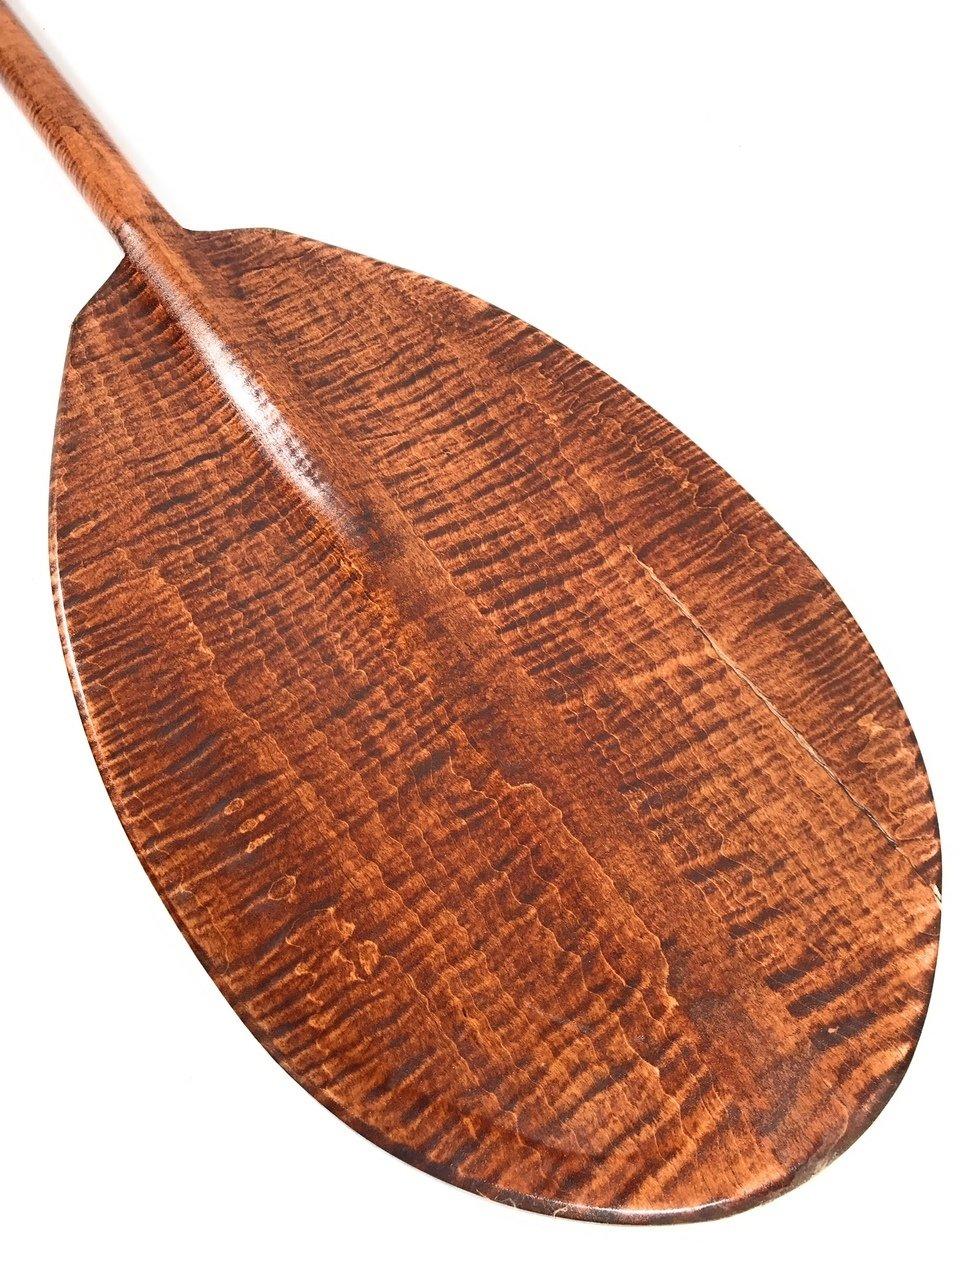 Steersman Decorative Paddle 60'' - Tiger Curls | #koa6095